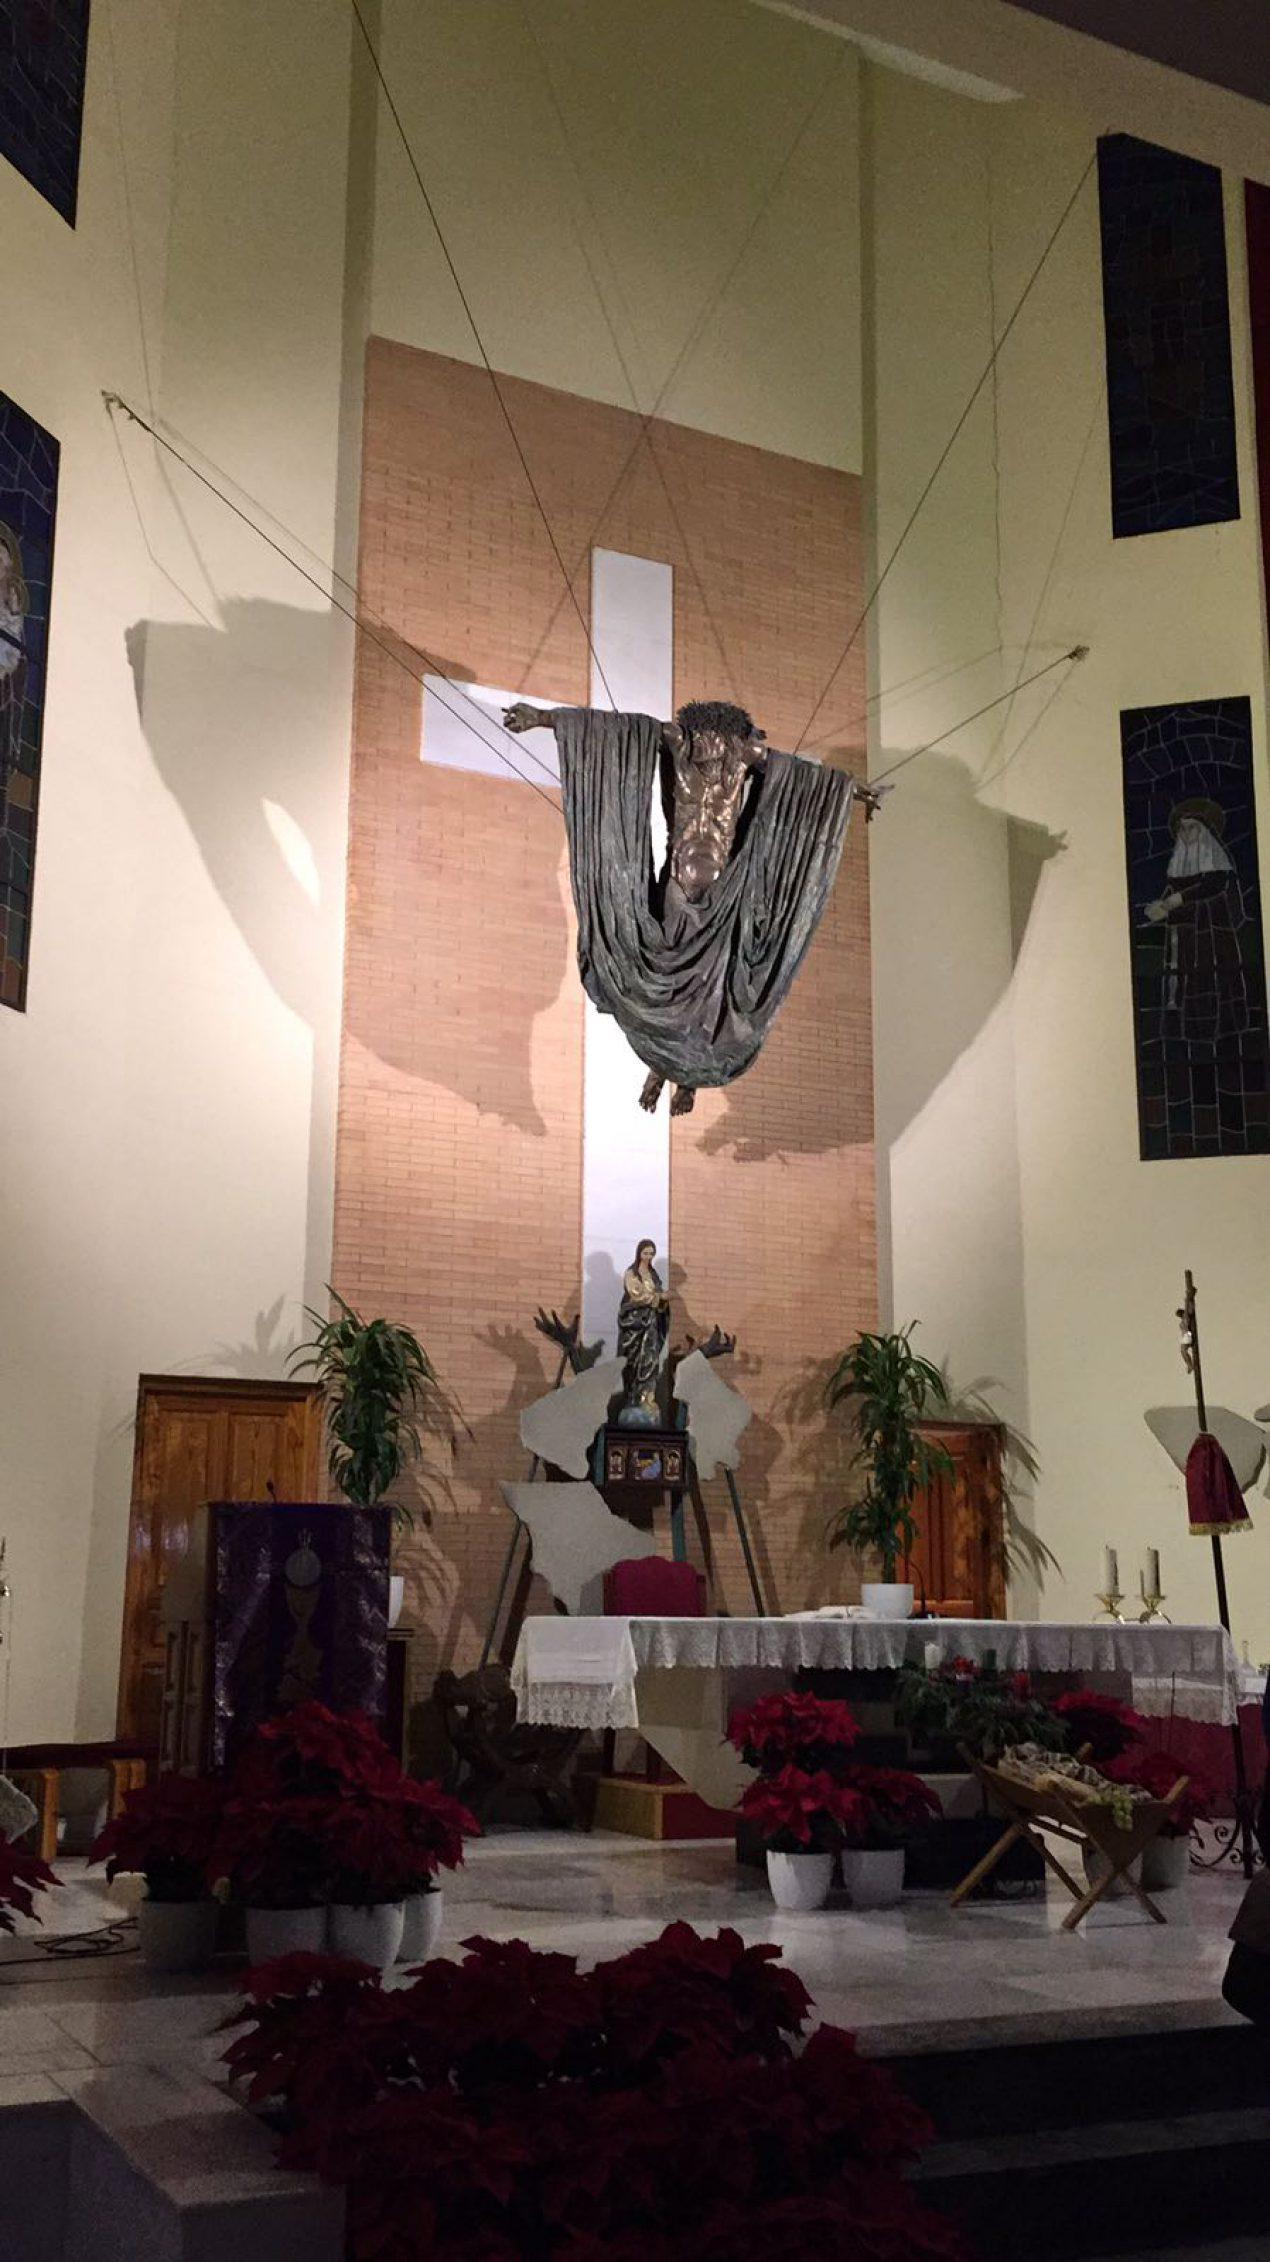 La Luz de la Paz de Belén llegó a la Archidiócesis de Sevilla